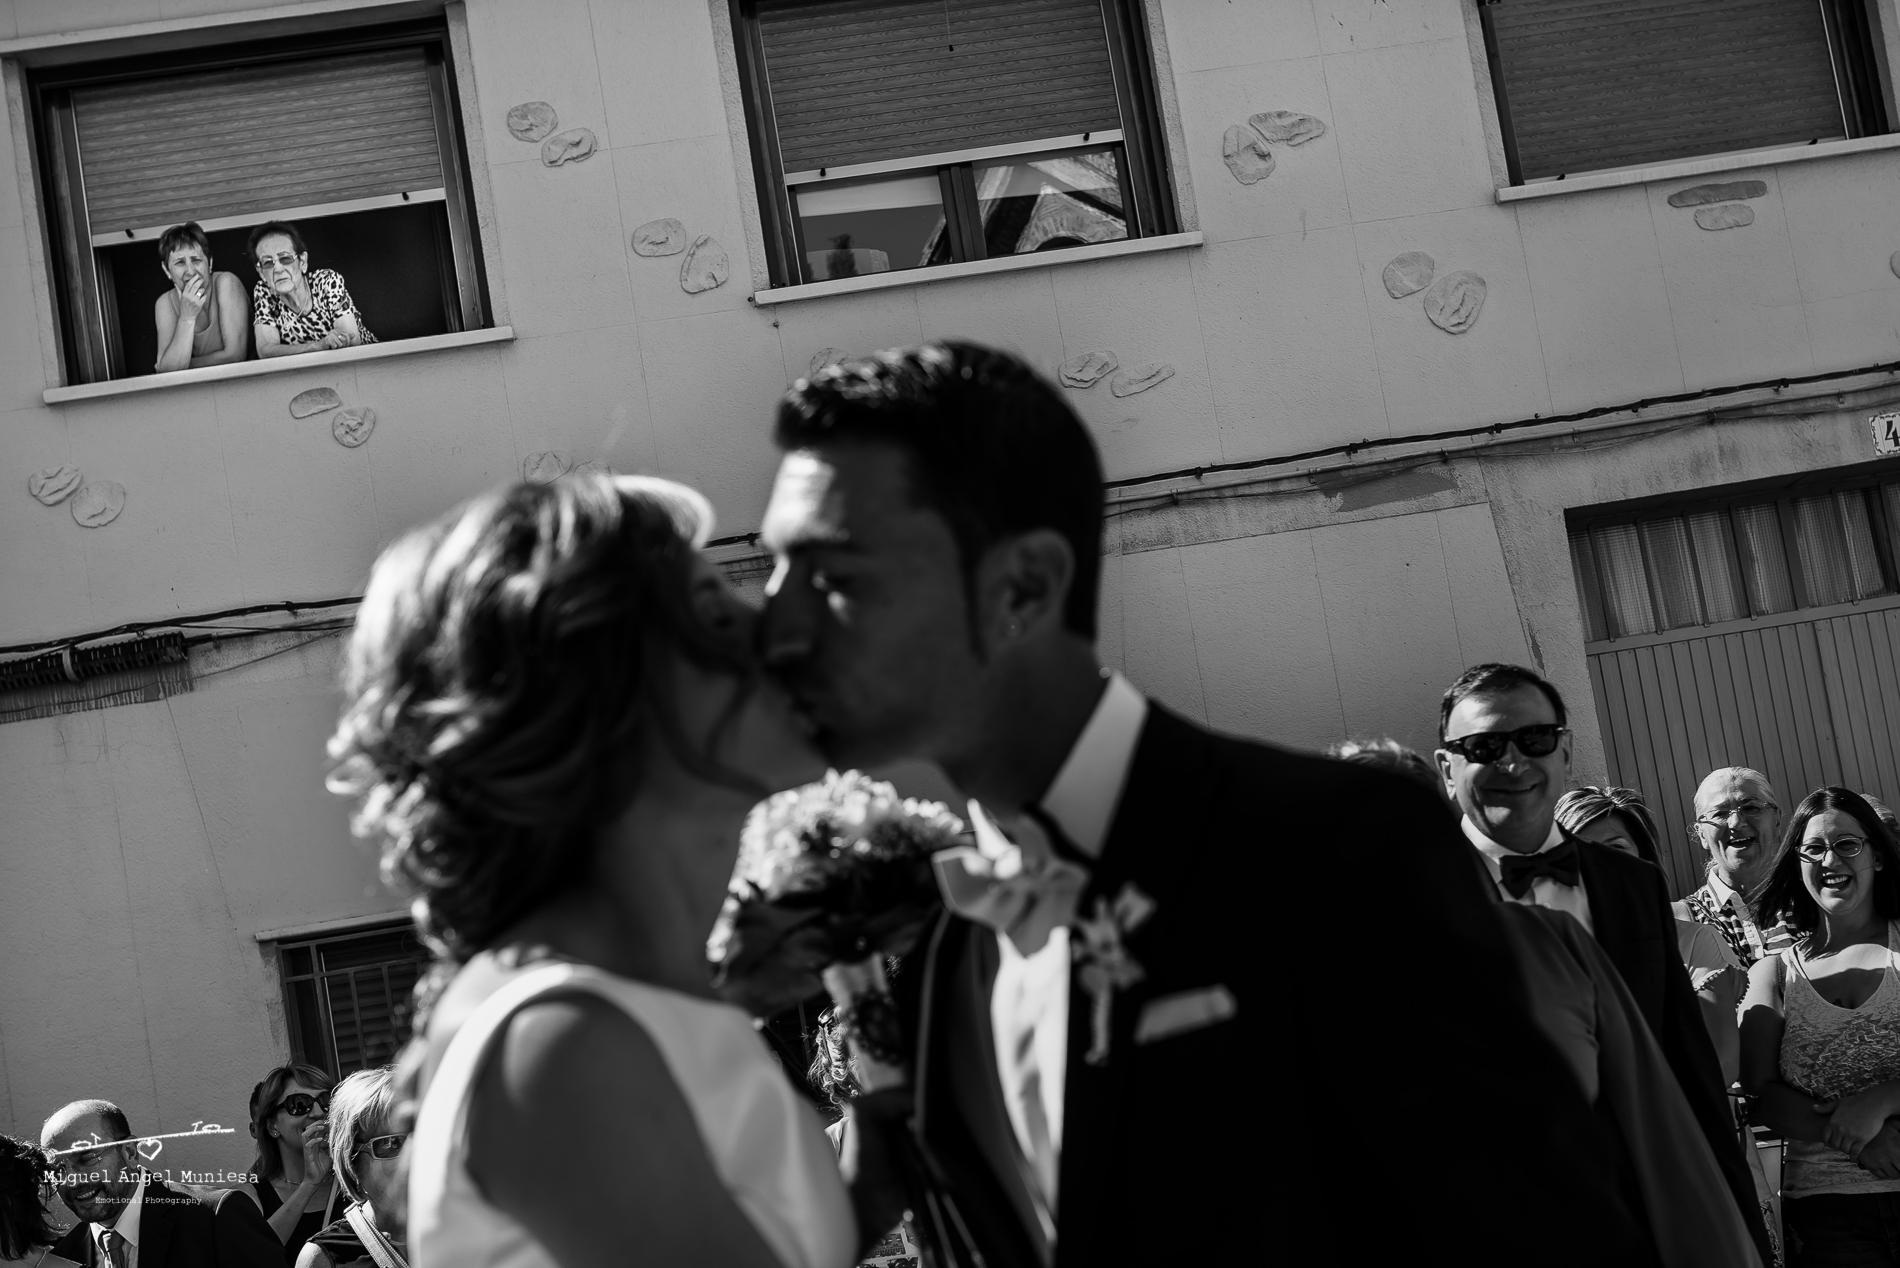 boda, fotografia de boda, boda zaragoza, fotografia, wedding, wedding photography, miguel angel muniesa, fotografo boda Zaragoza, fotografo boda, destination wedding_ 022